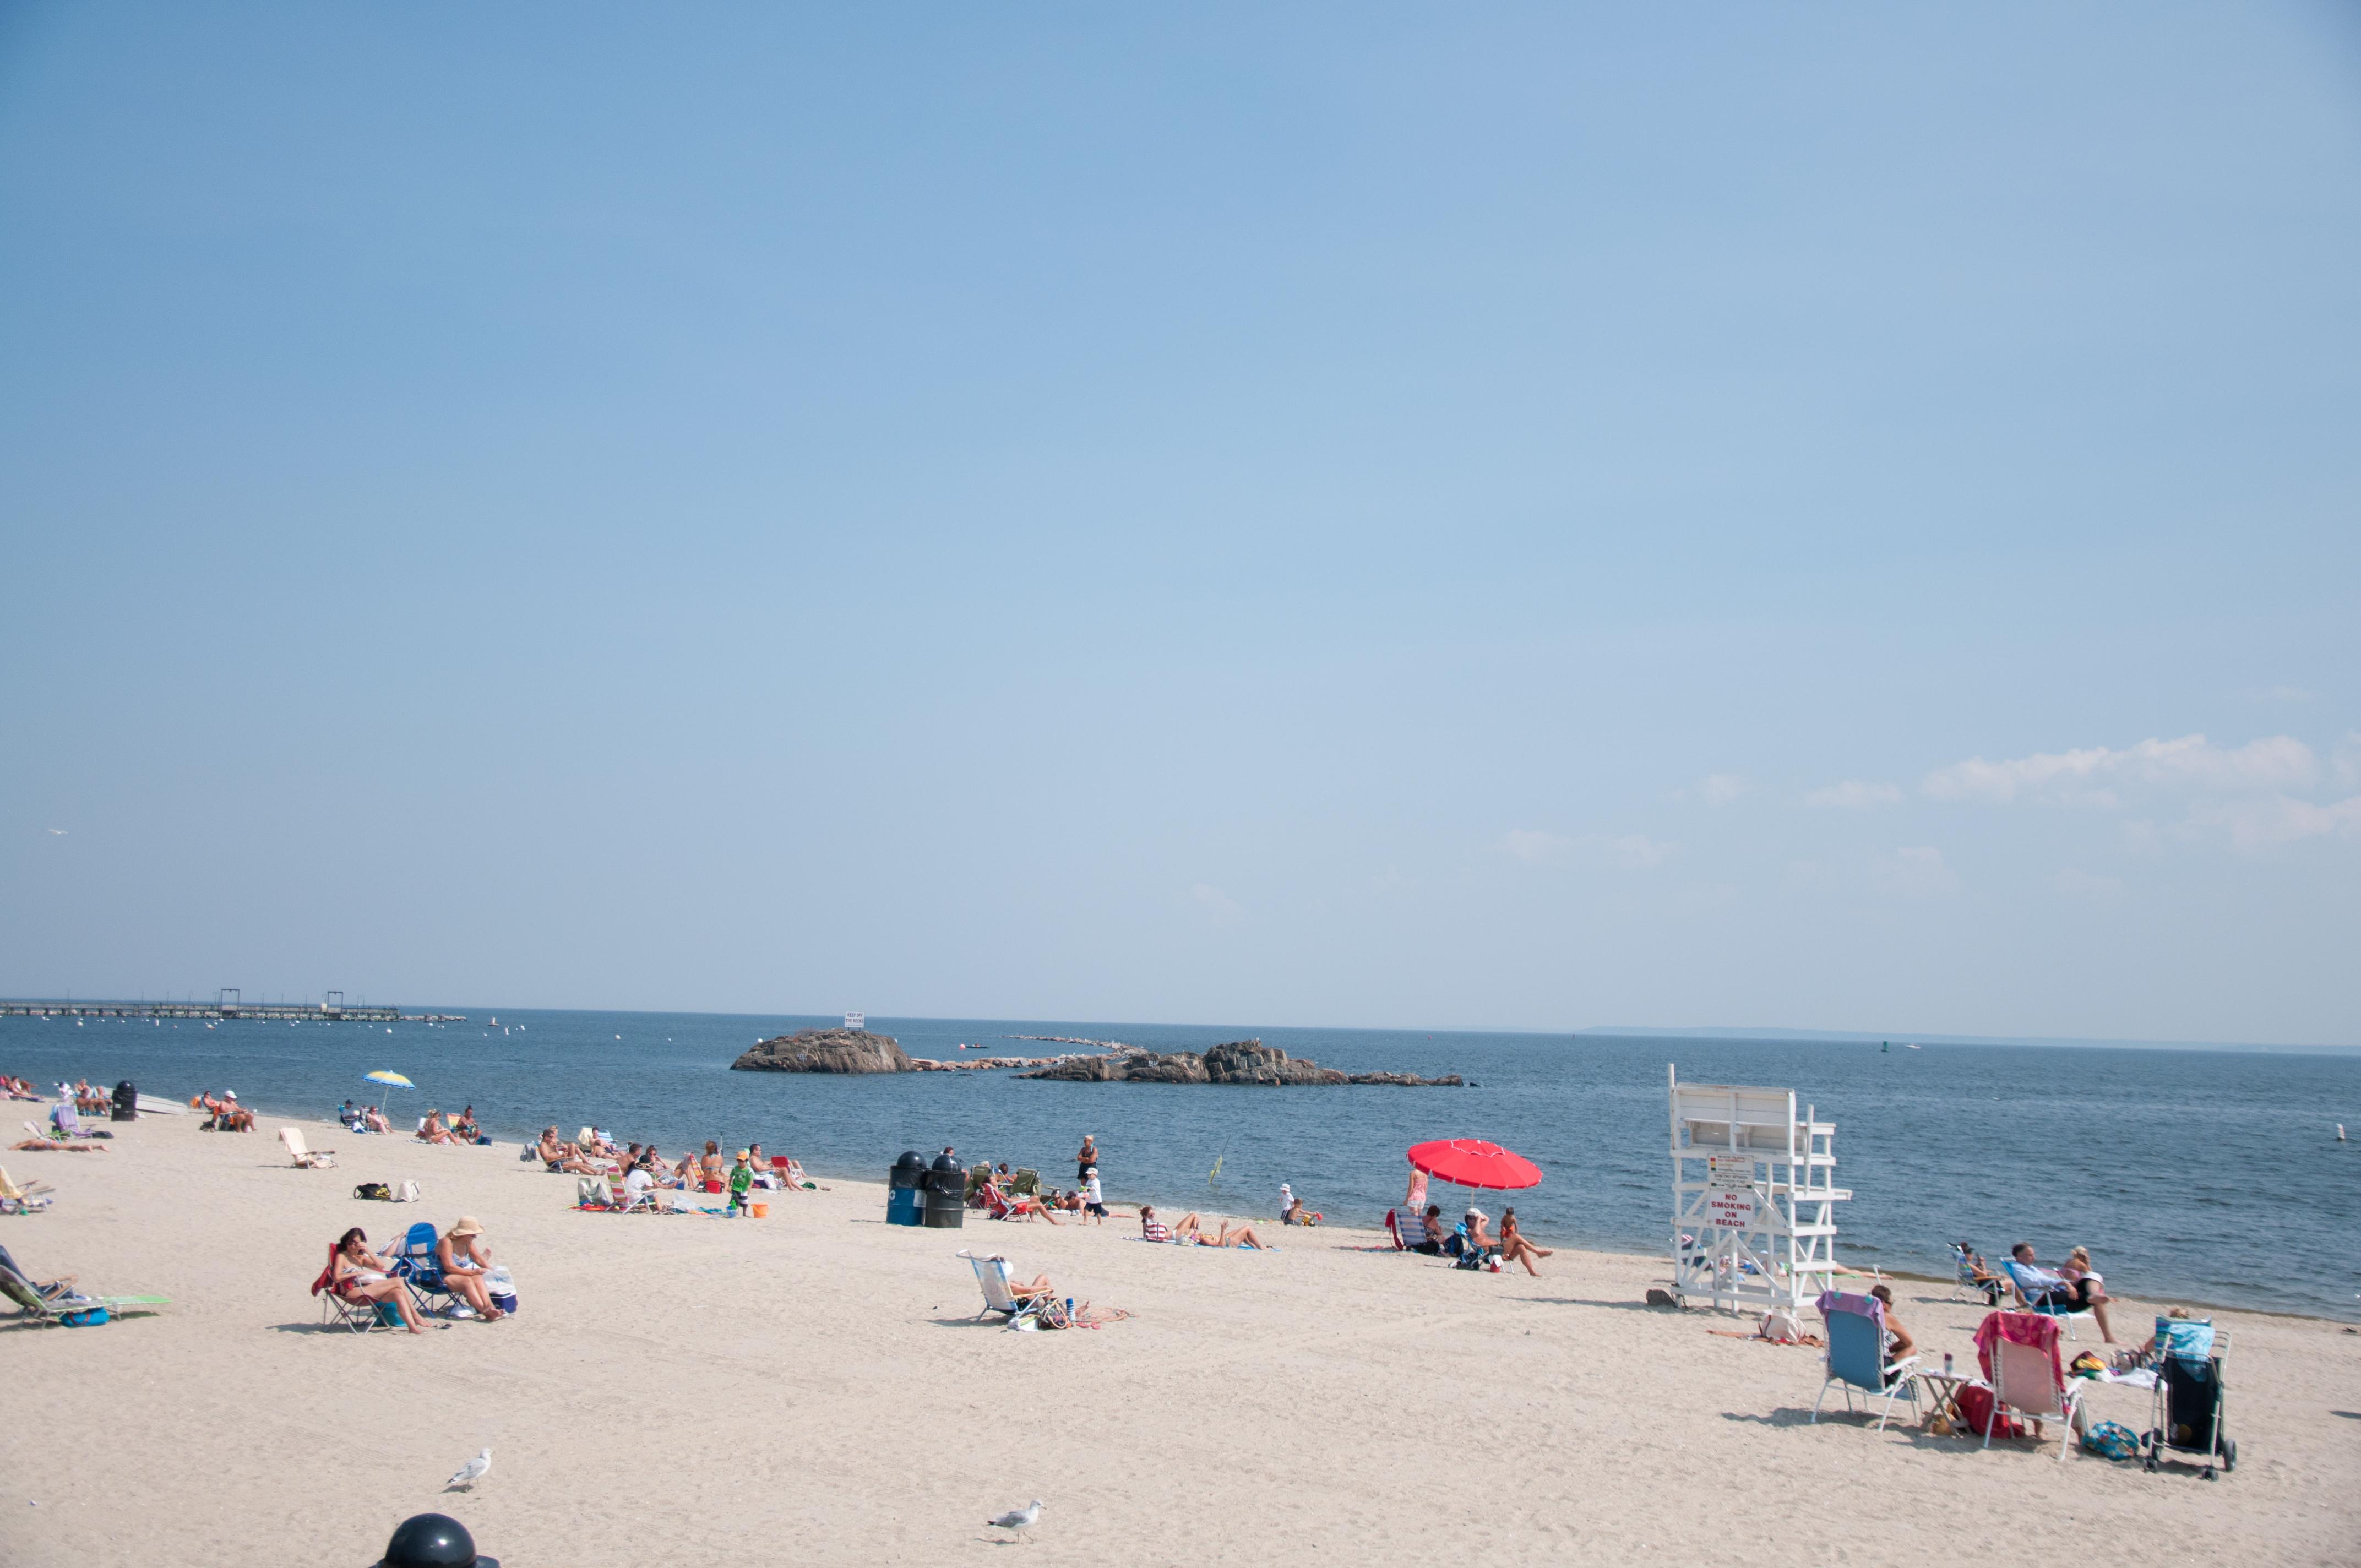 rye beach Pictures of rye beach in rye new york formerly oakland beach.